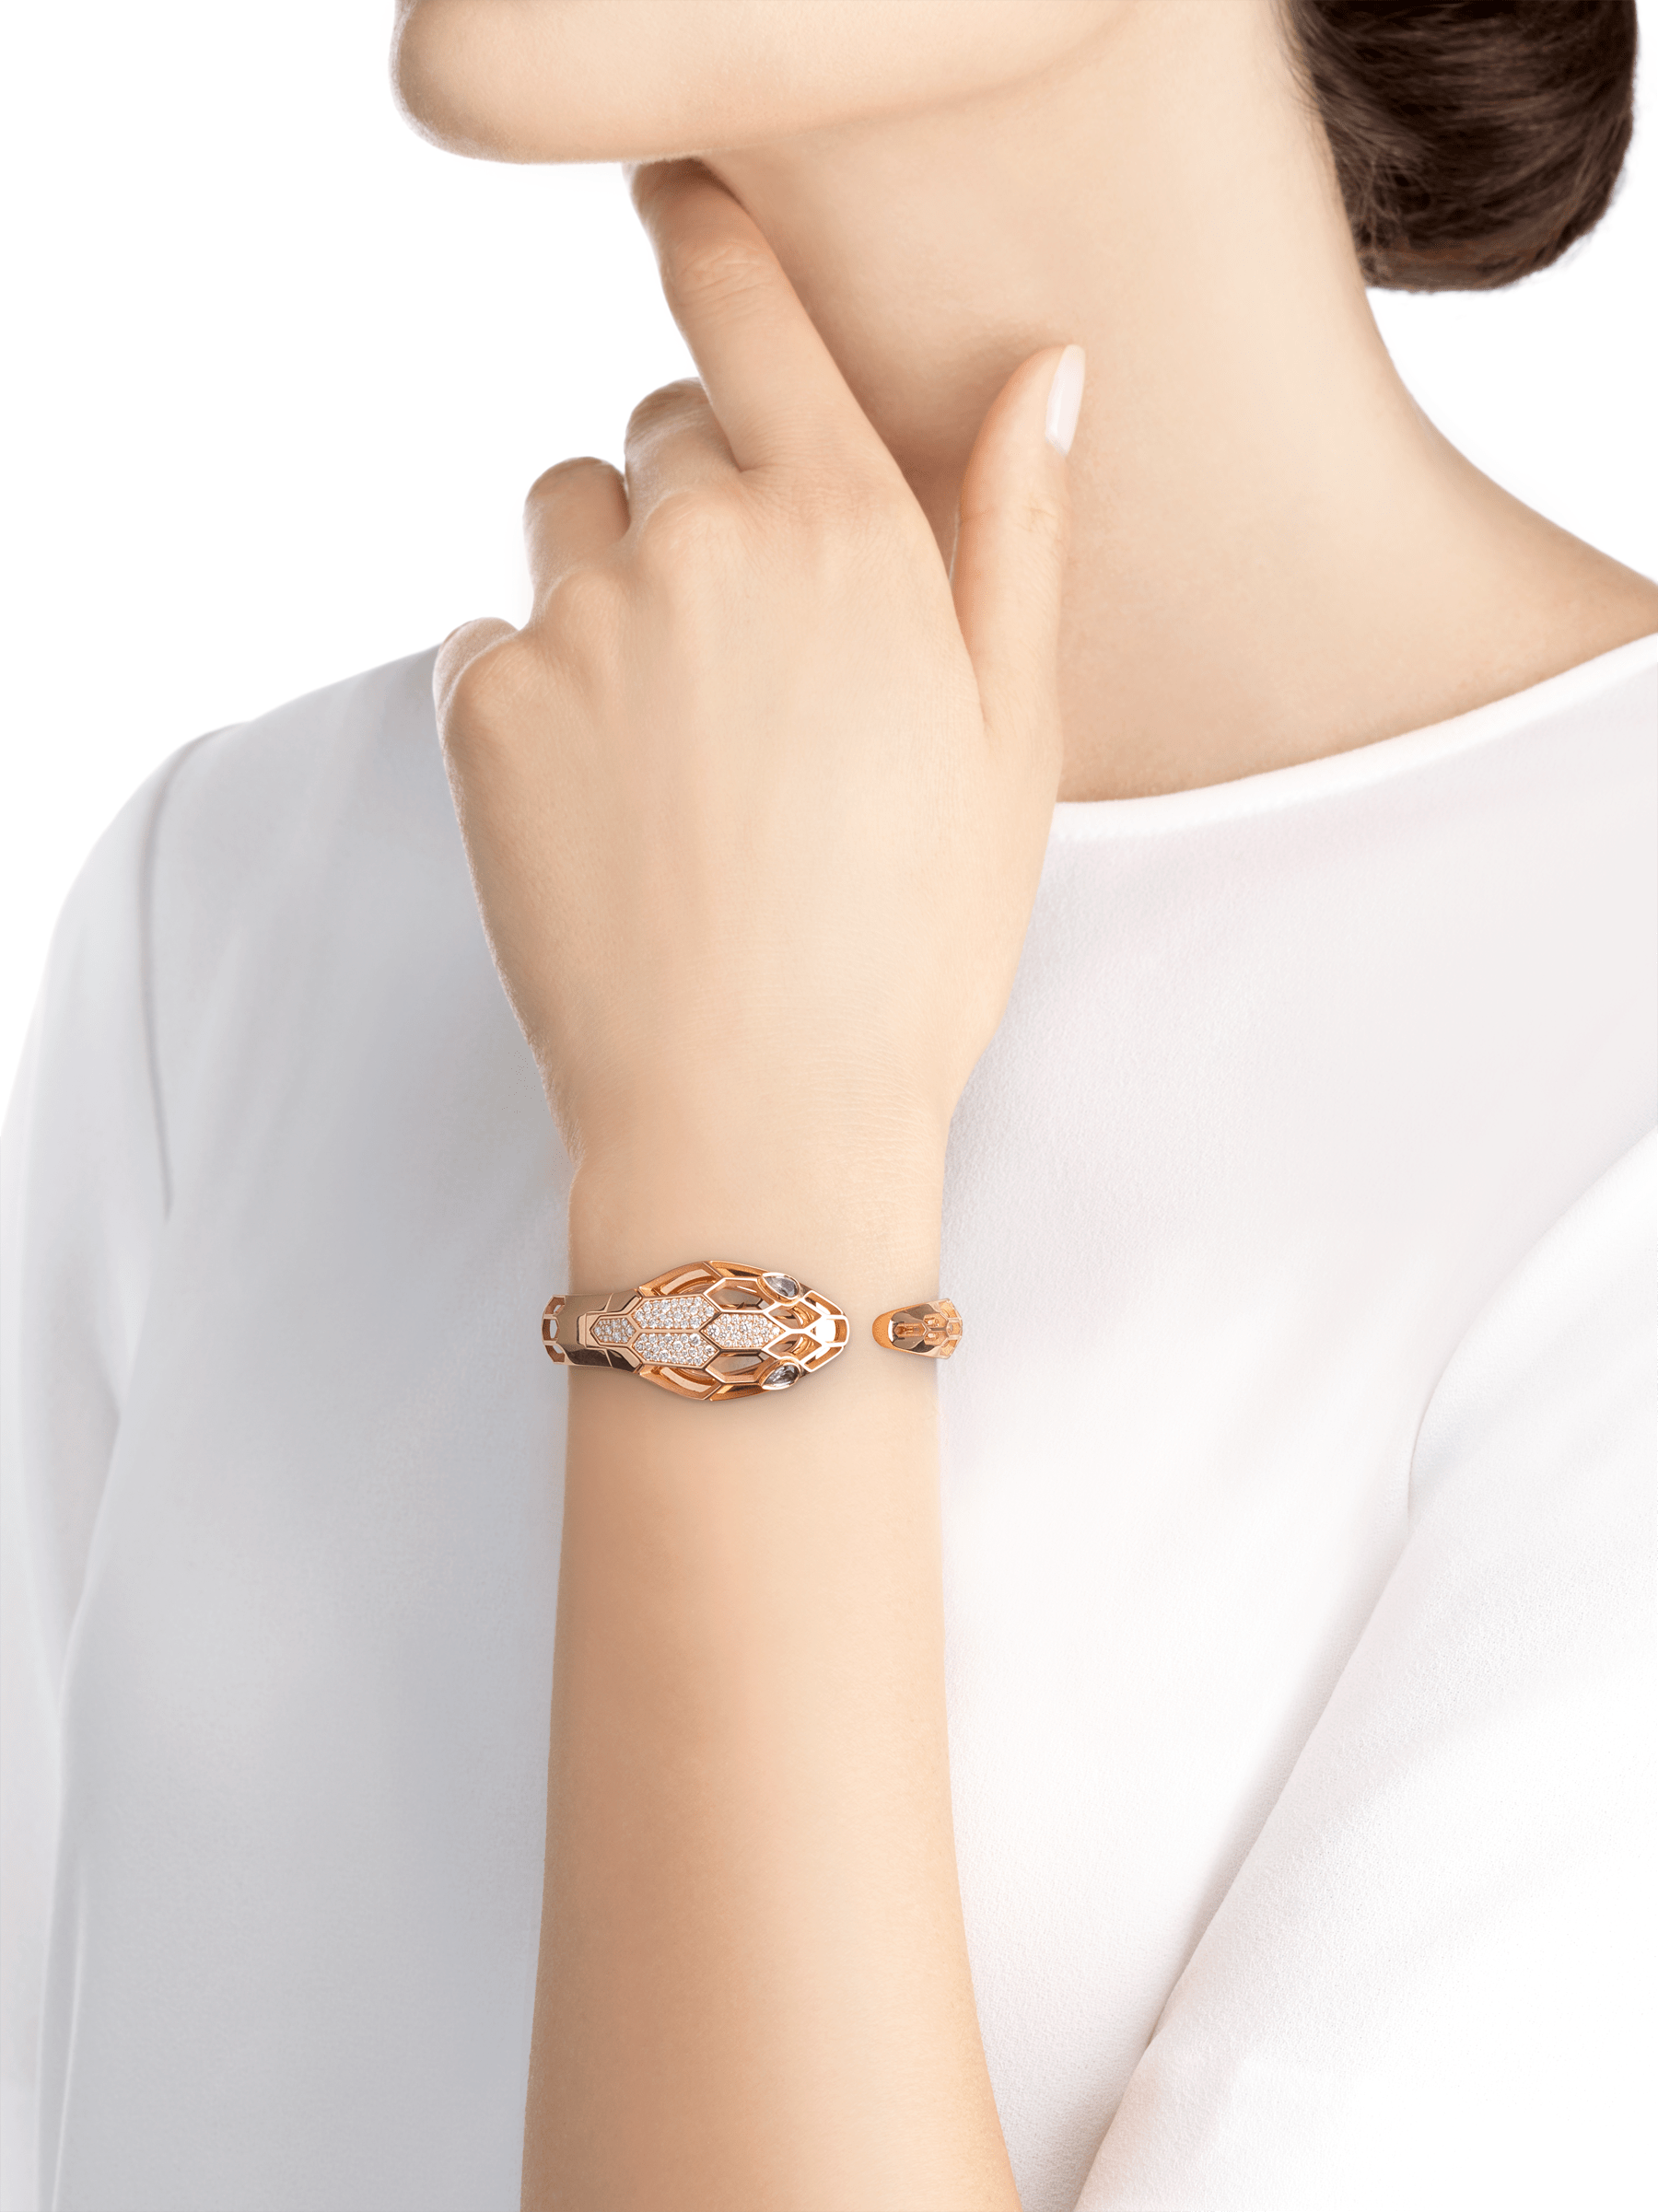 Serpenti Misteriosi Secret 腕錶,18K 玫瑰金鏤空錶殼鑲飾圓形明亮型切割鑽石,白色珍珠母貝錶盤,18K 玫瑰金鏤空手鐲式錶帶,蛇眼鑲飾梨形紫水晶。M 尺寸。 SrpntMister-SecretWtc-rose-gold image 7